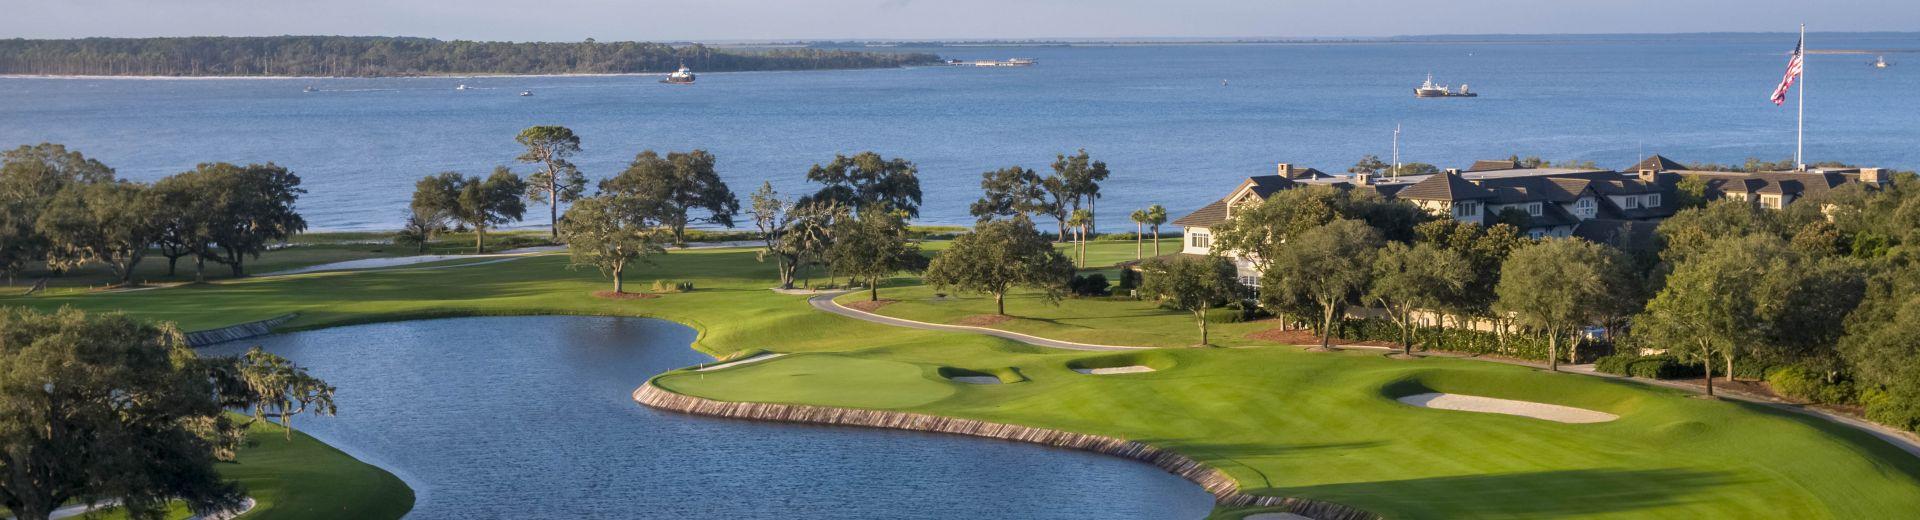 An early morning photo of the Seaside Course at Sea Island Club in Sea Island Georgia overlooking the Atlantic Ocean